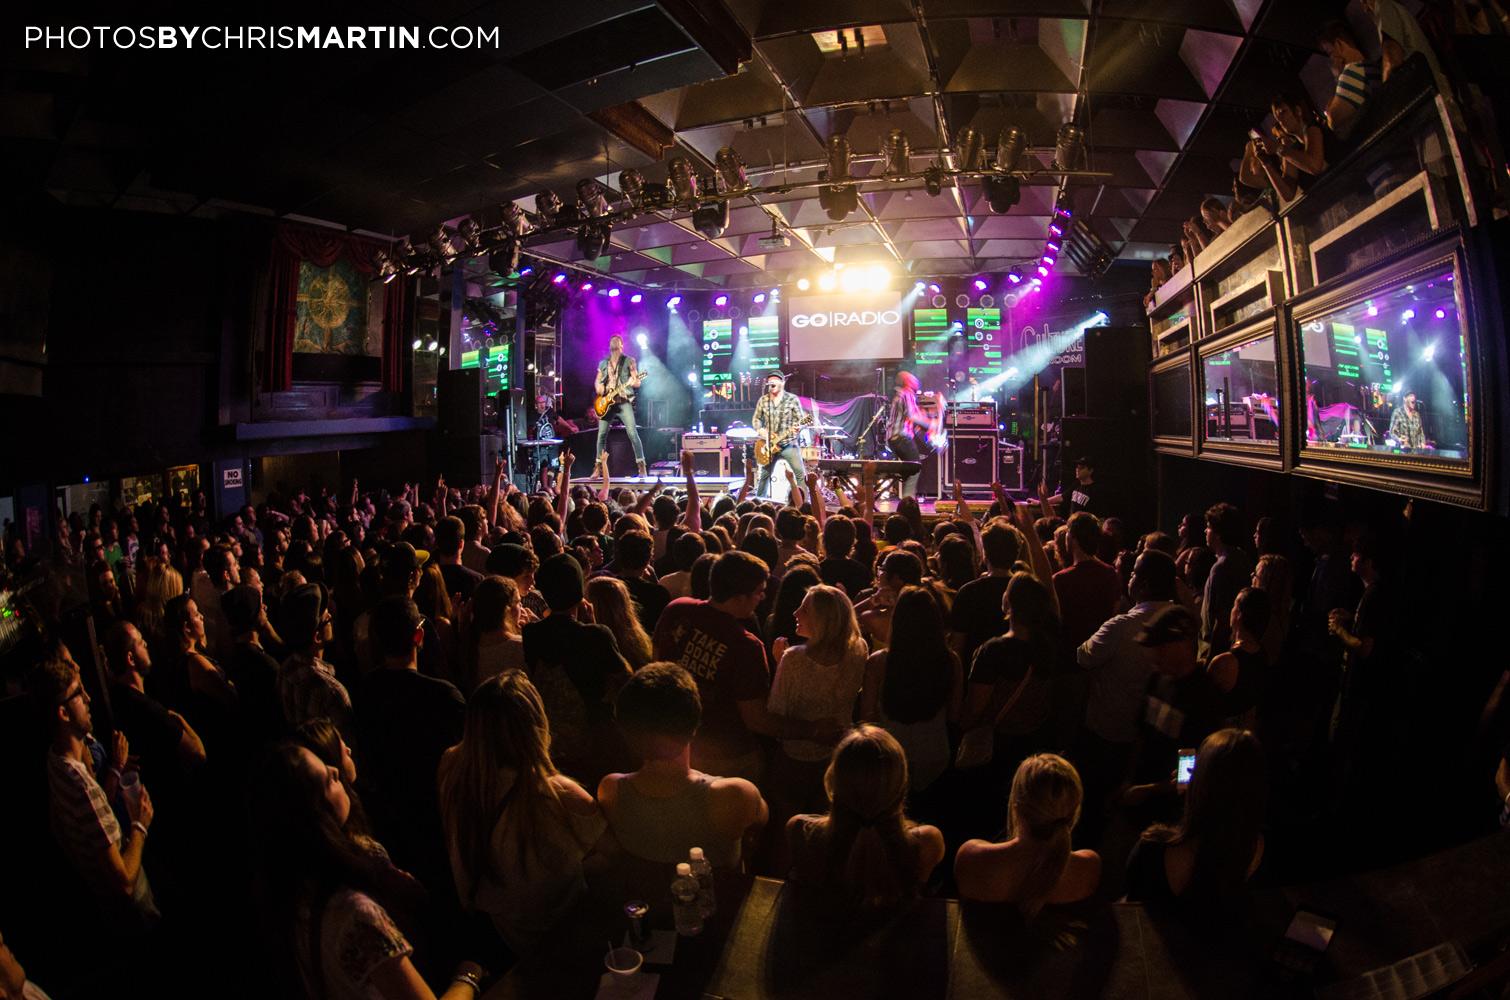 8 Go Radio Live Concert Culture Room Fort Lauderdale